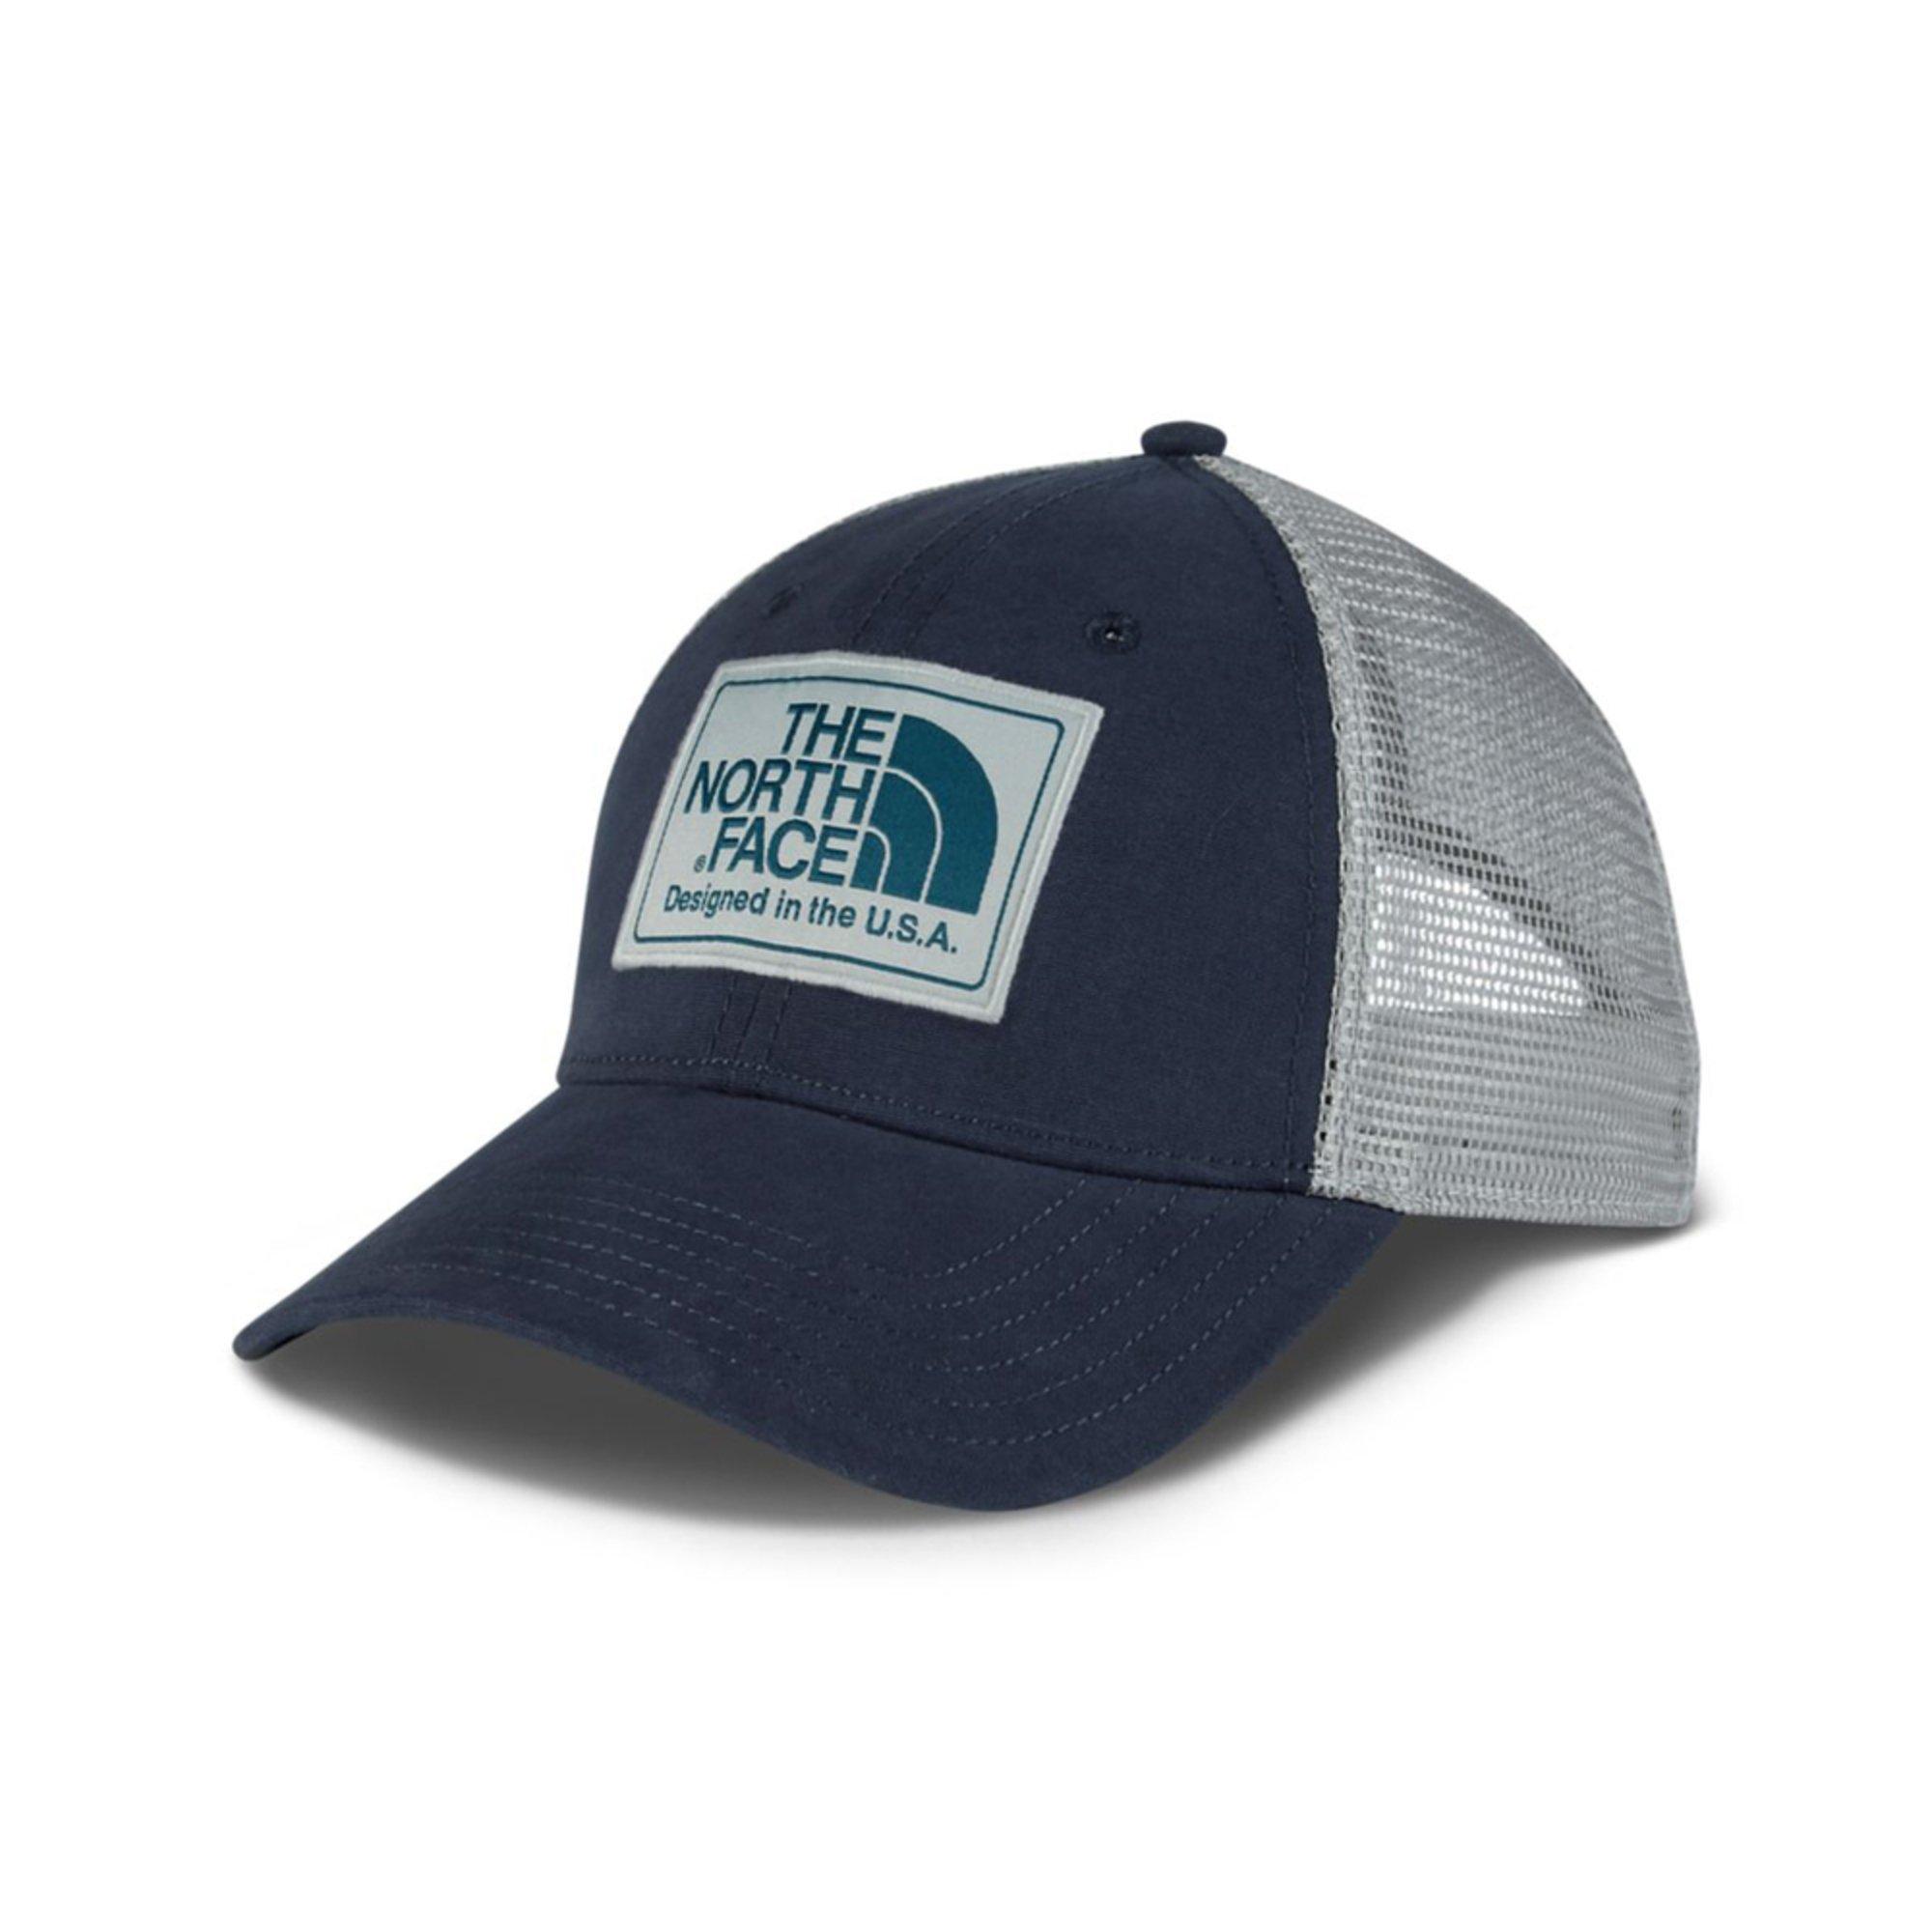 7b665579cc The North Face Men s Mudder Trucker Hat